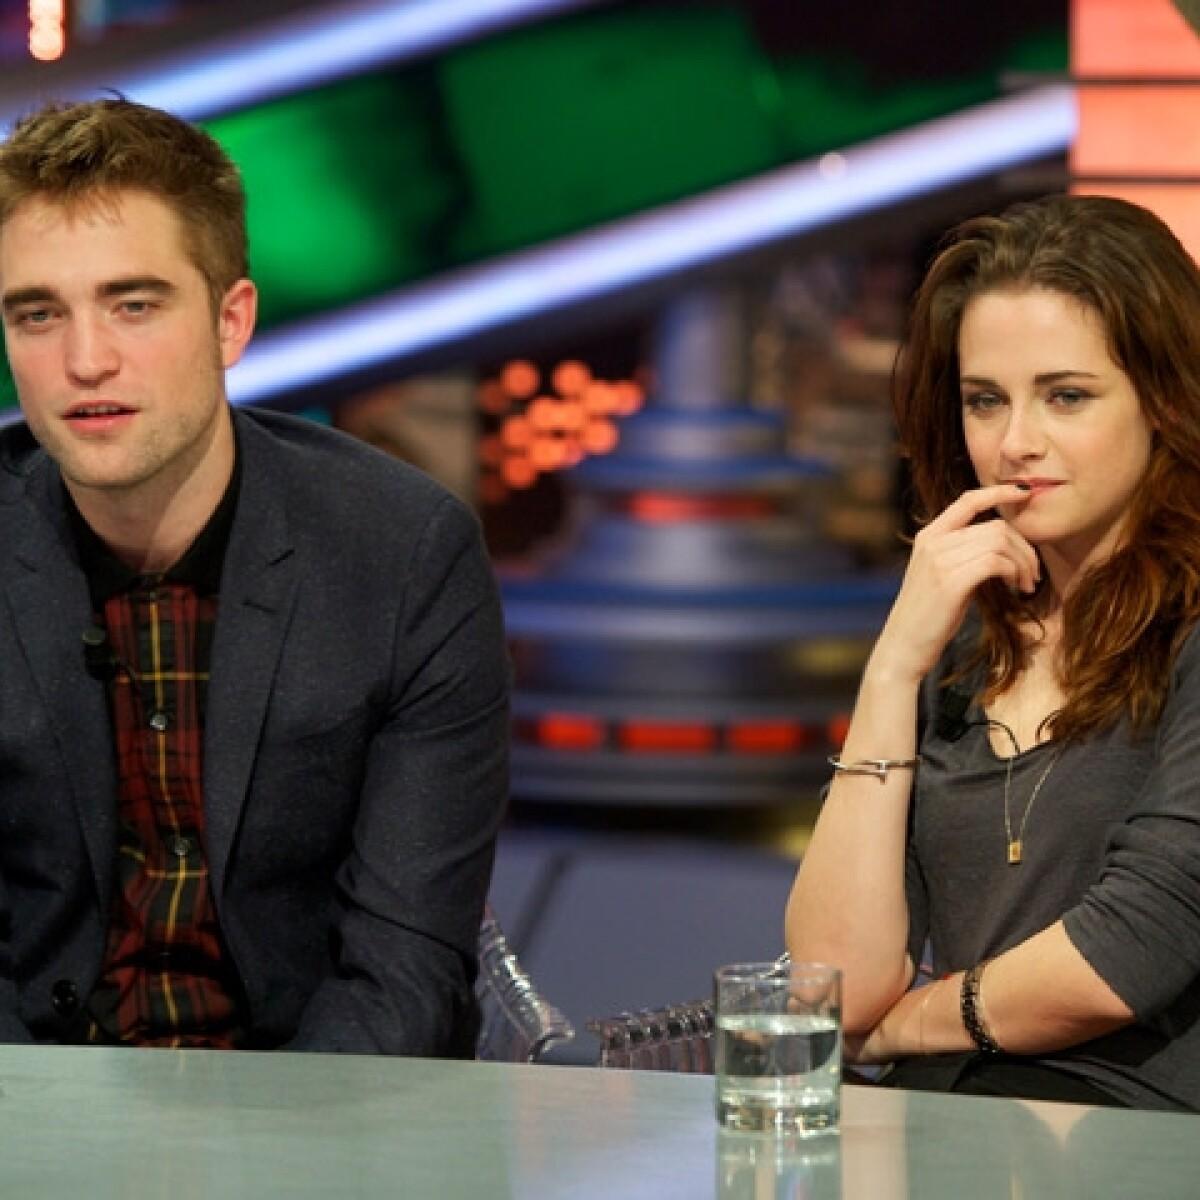 Kristen Stewart sorprende a Pattinson con una mesa de billar